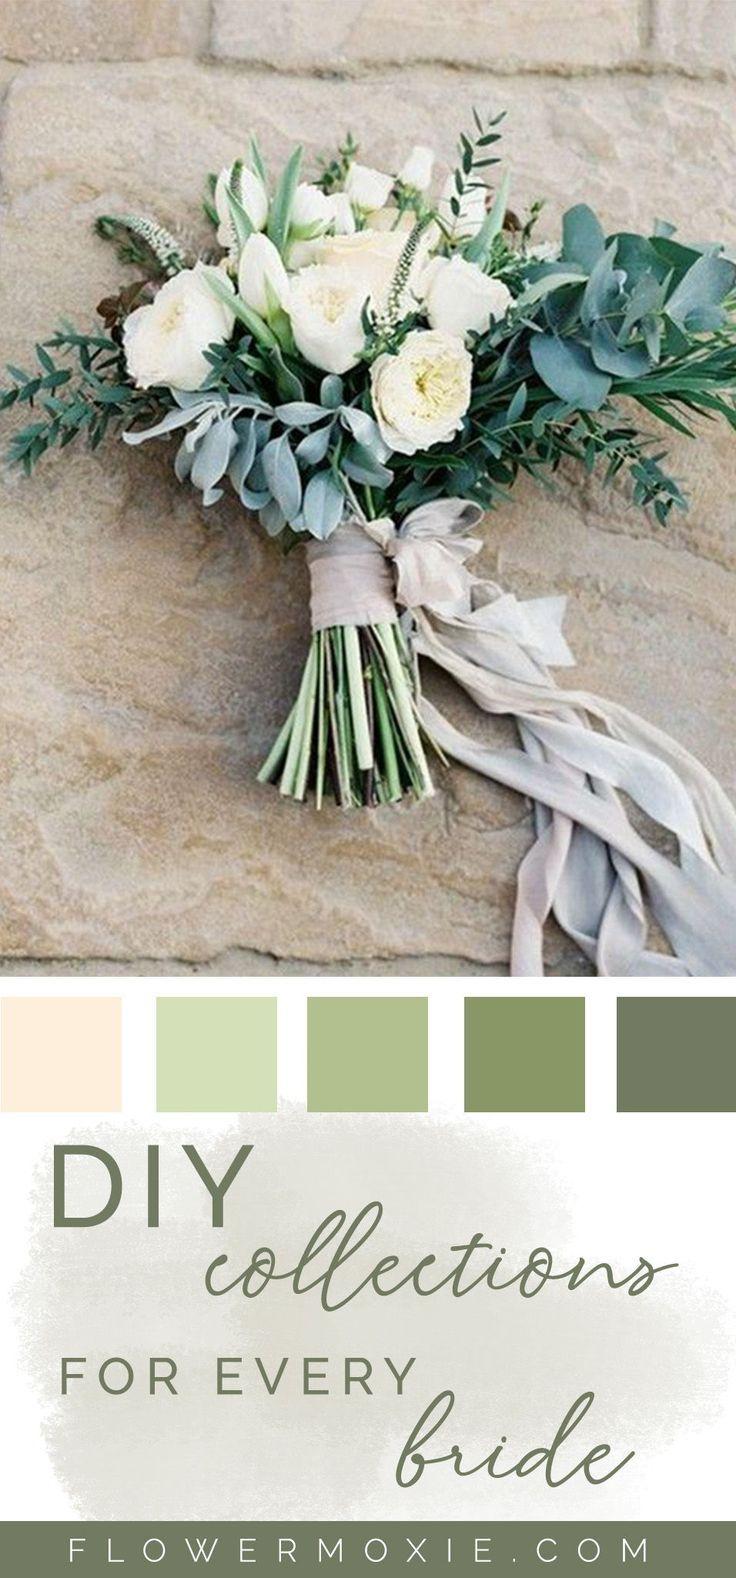 Moodboard Mini In 2020 Wedding Flower Packages Cheap Wedding Flowers Affordable Wedding Flowers